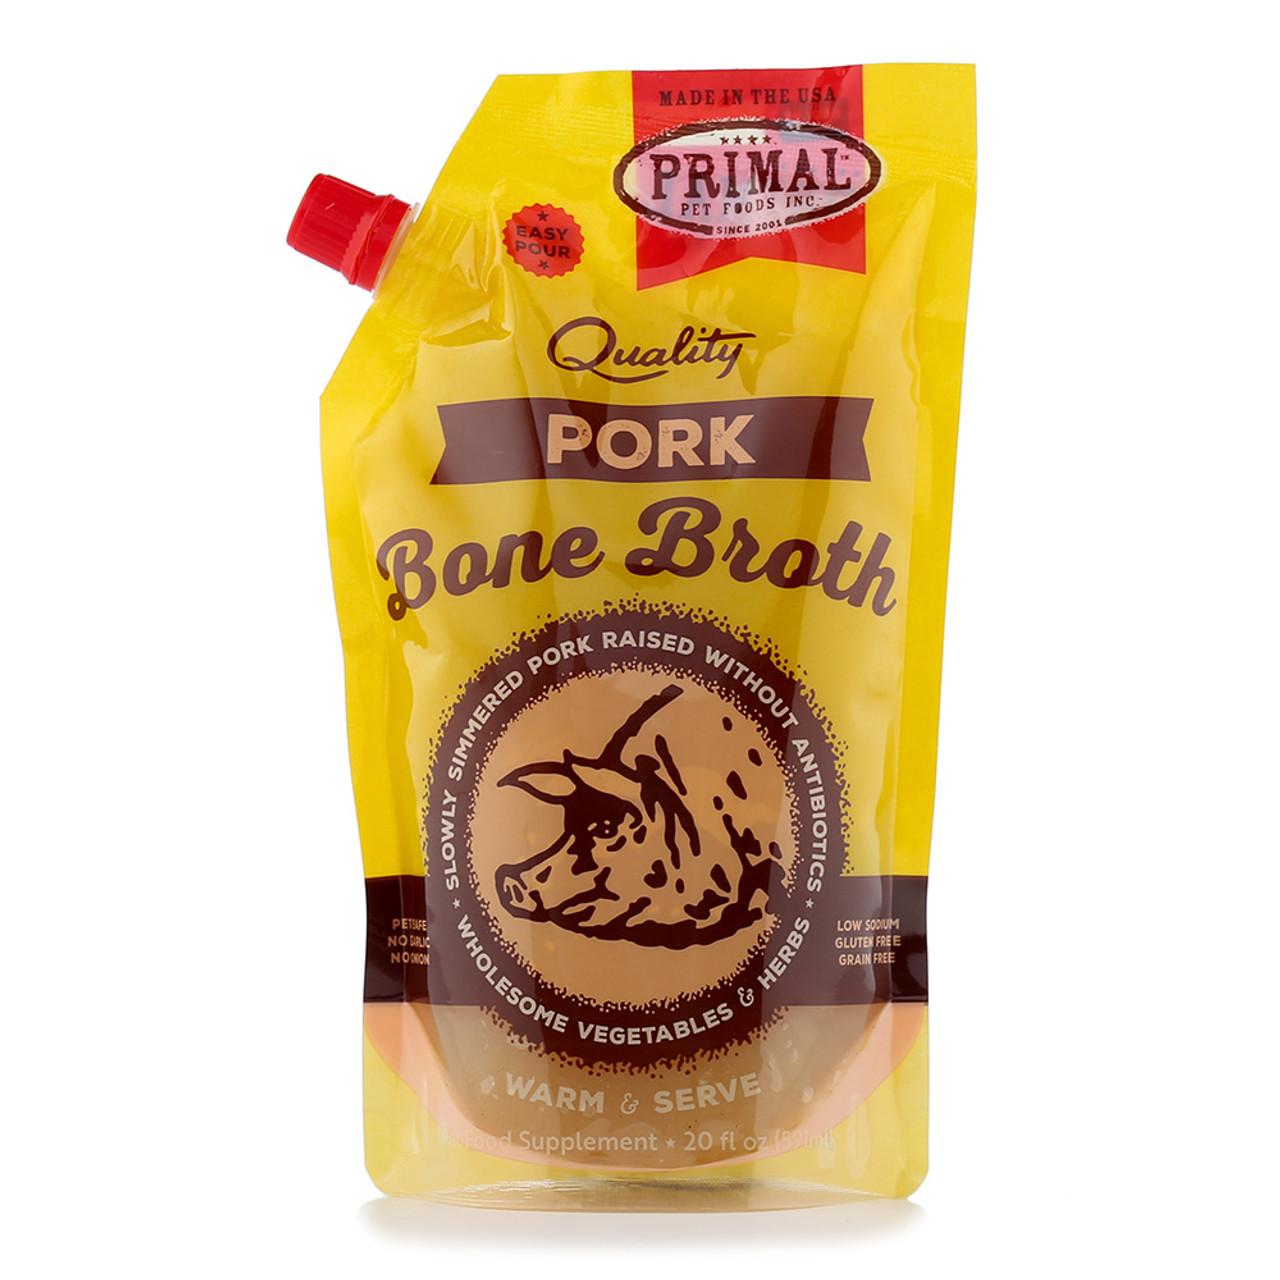 Primal Frozen Pork Bone Broth for Cats & Dogs